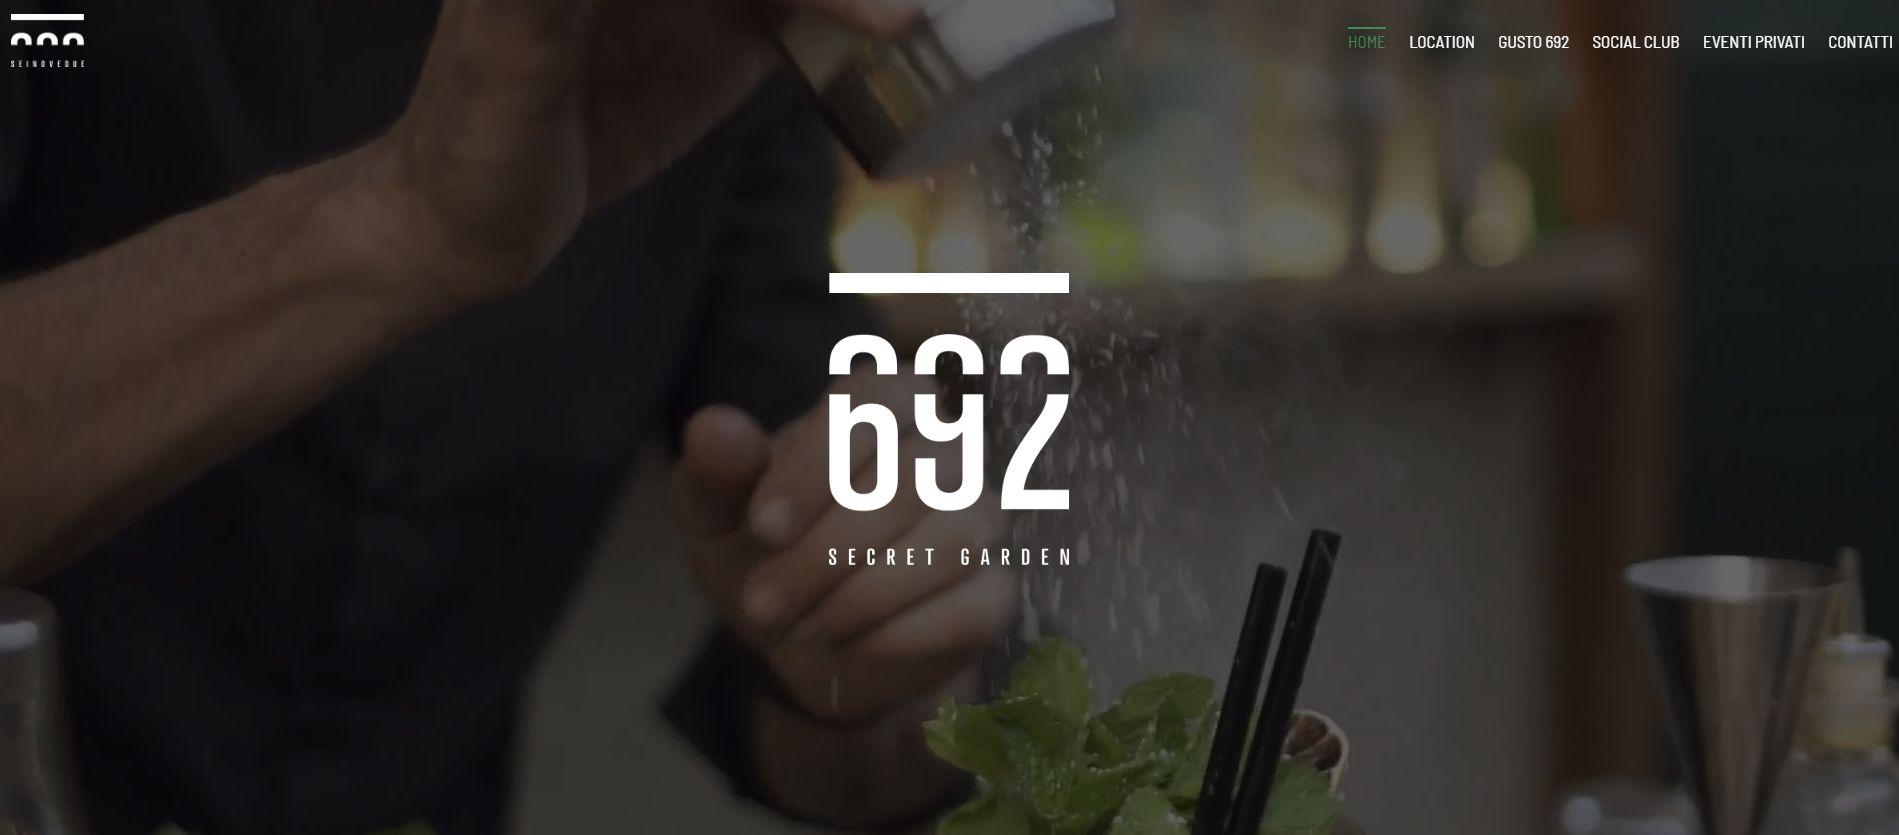 michele-settembre-tbm-692-seinovedue-secret-garden-02